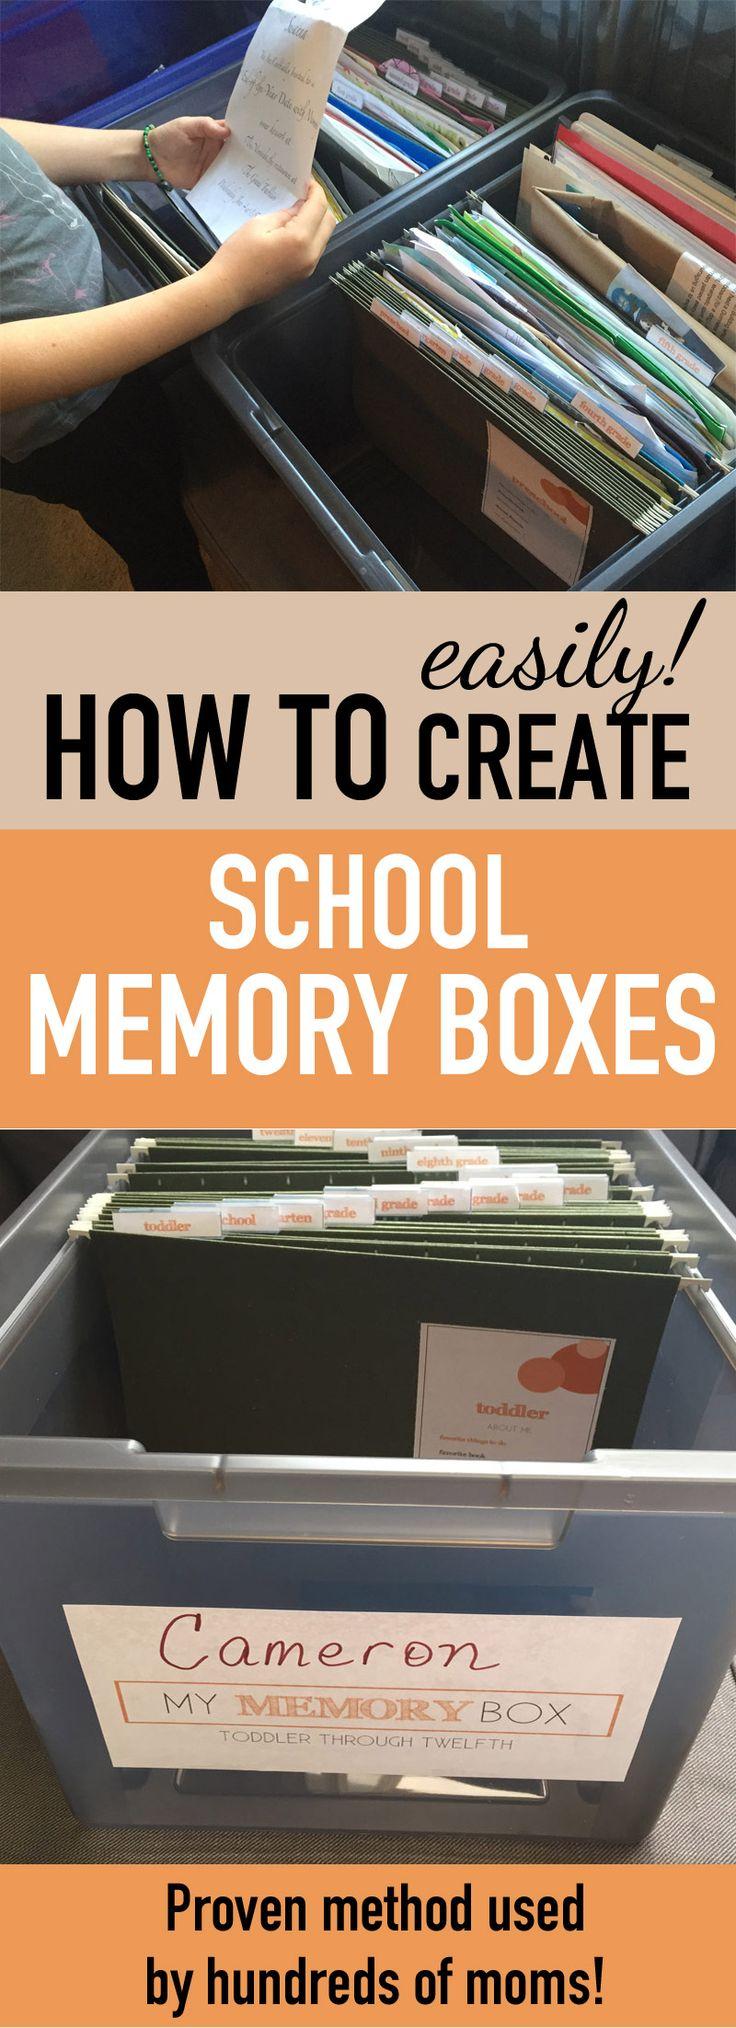 How to make scrapbook using illustration board - My Memory Box School Memory Box System